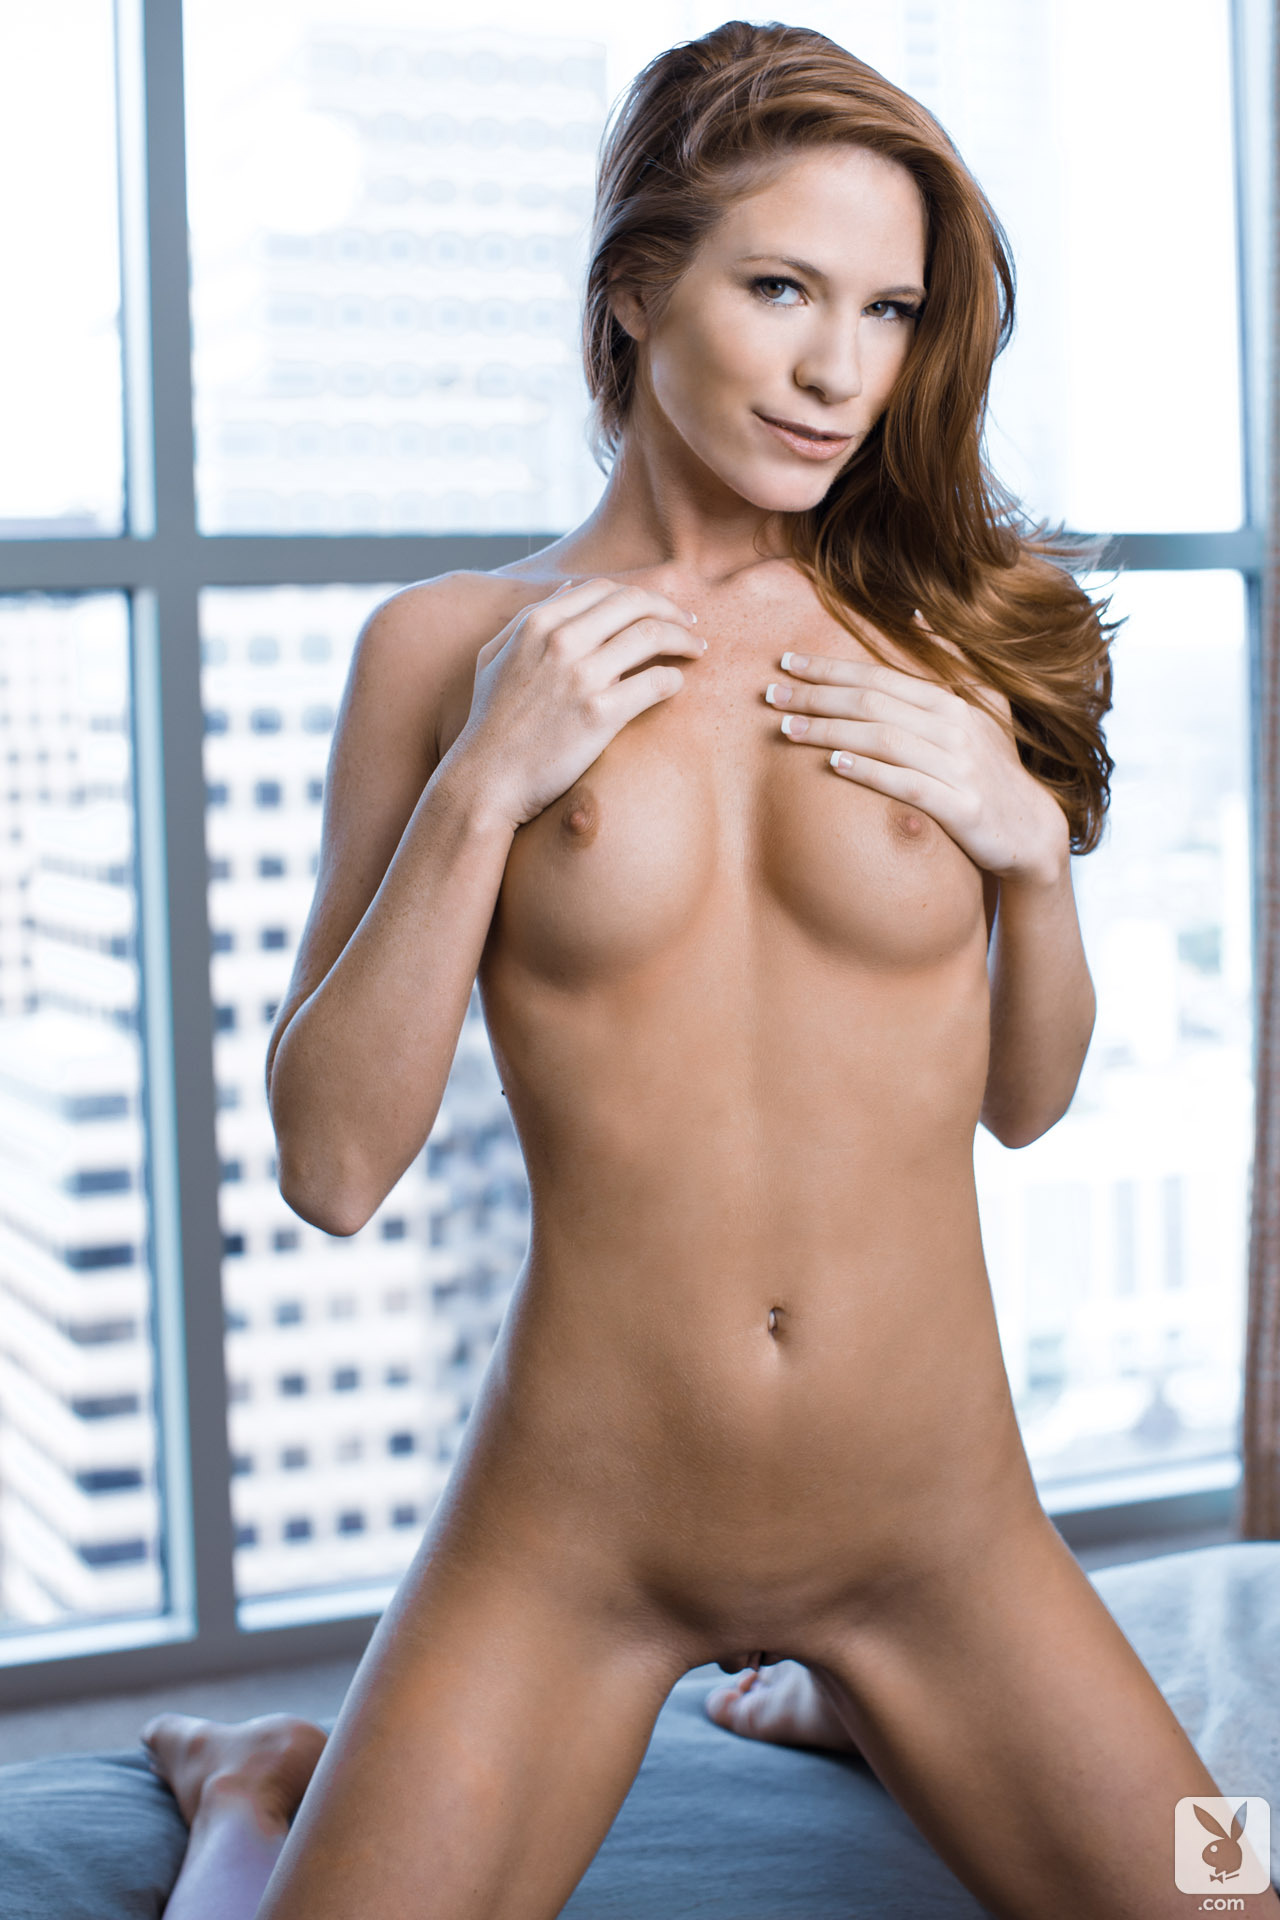 bree-morgan-nude-apartment-redhead-playboy-15